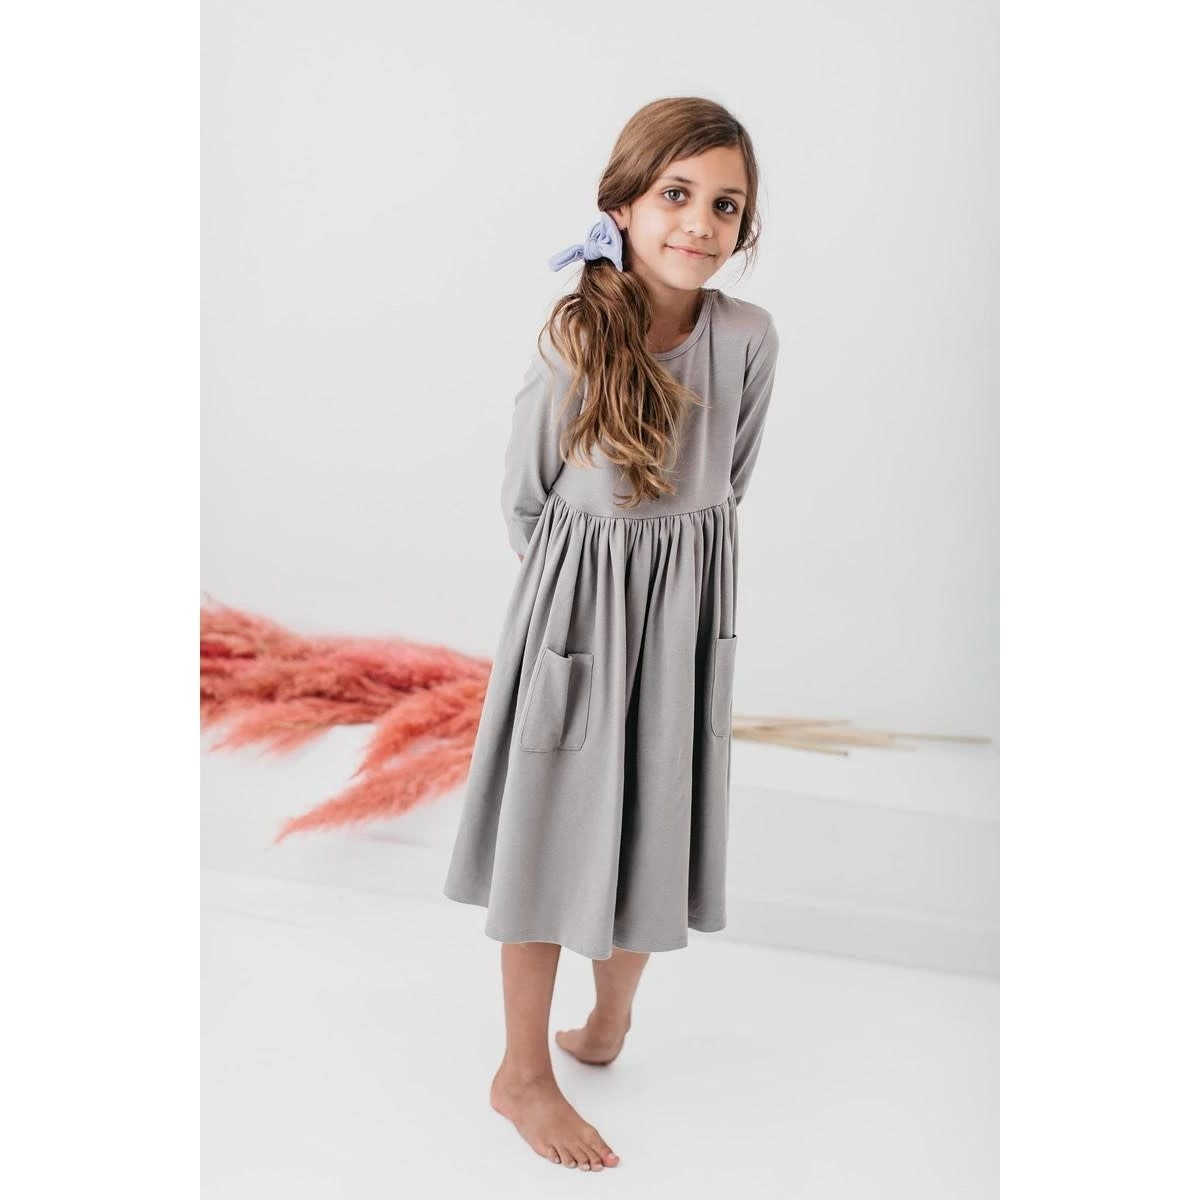 Mila & Rose Gray 3/4 Sleeve Pocket Twirl Dress